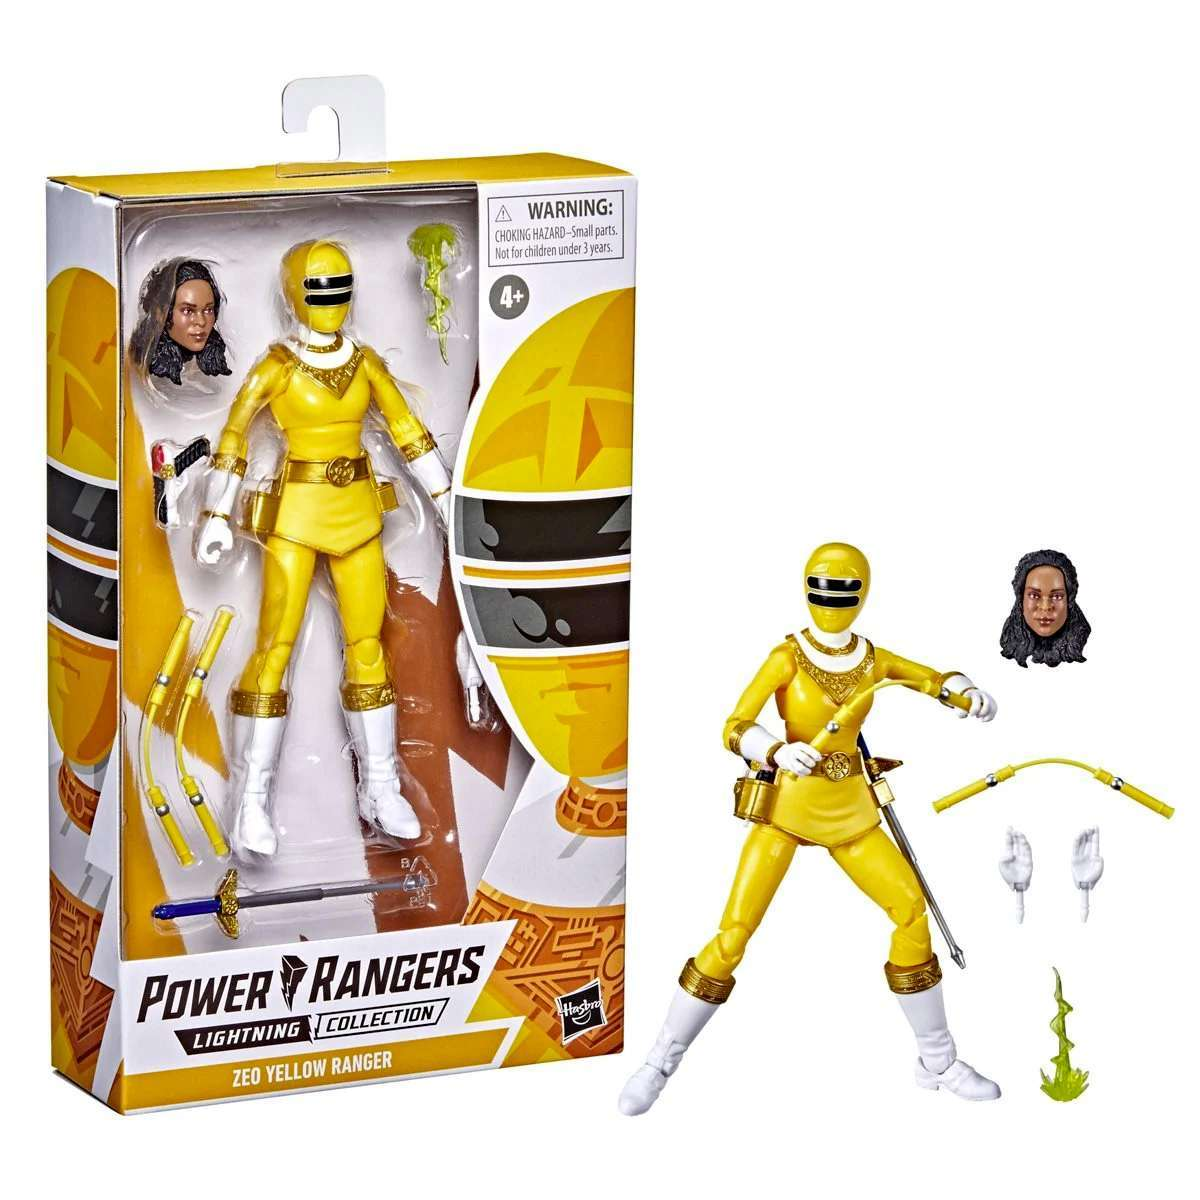 power-rangers-yellow-ranger